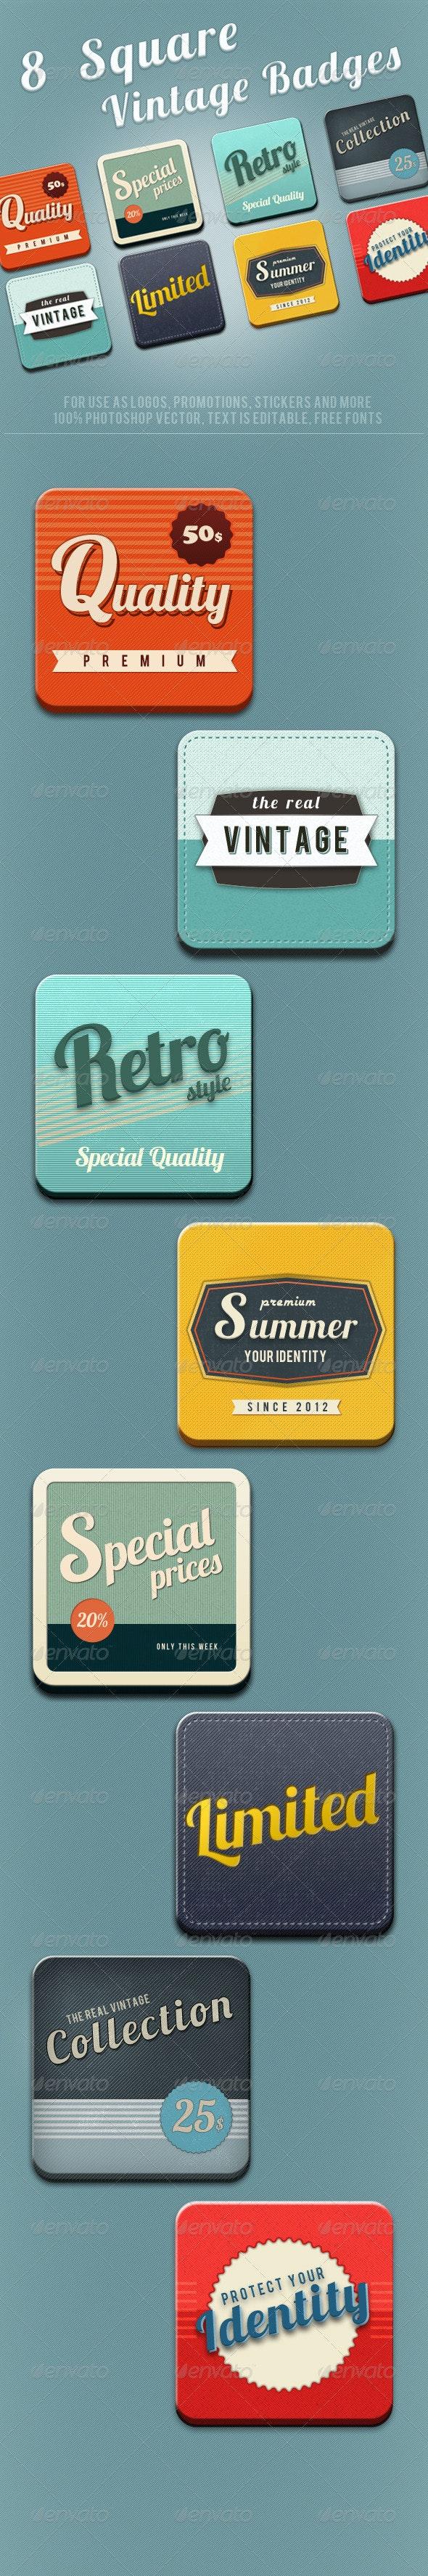 8 Square Vintage Badges  - Badges & Stickers Web Elements